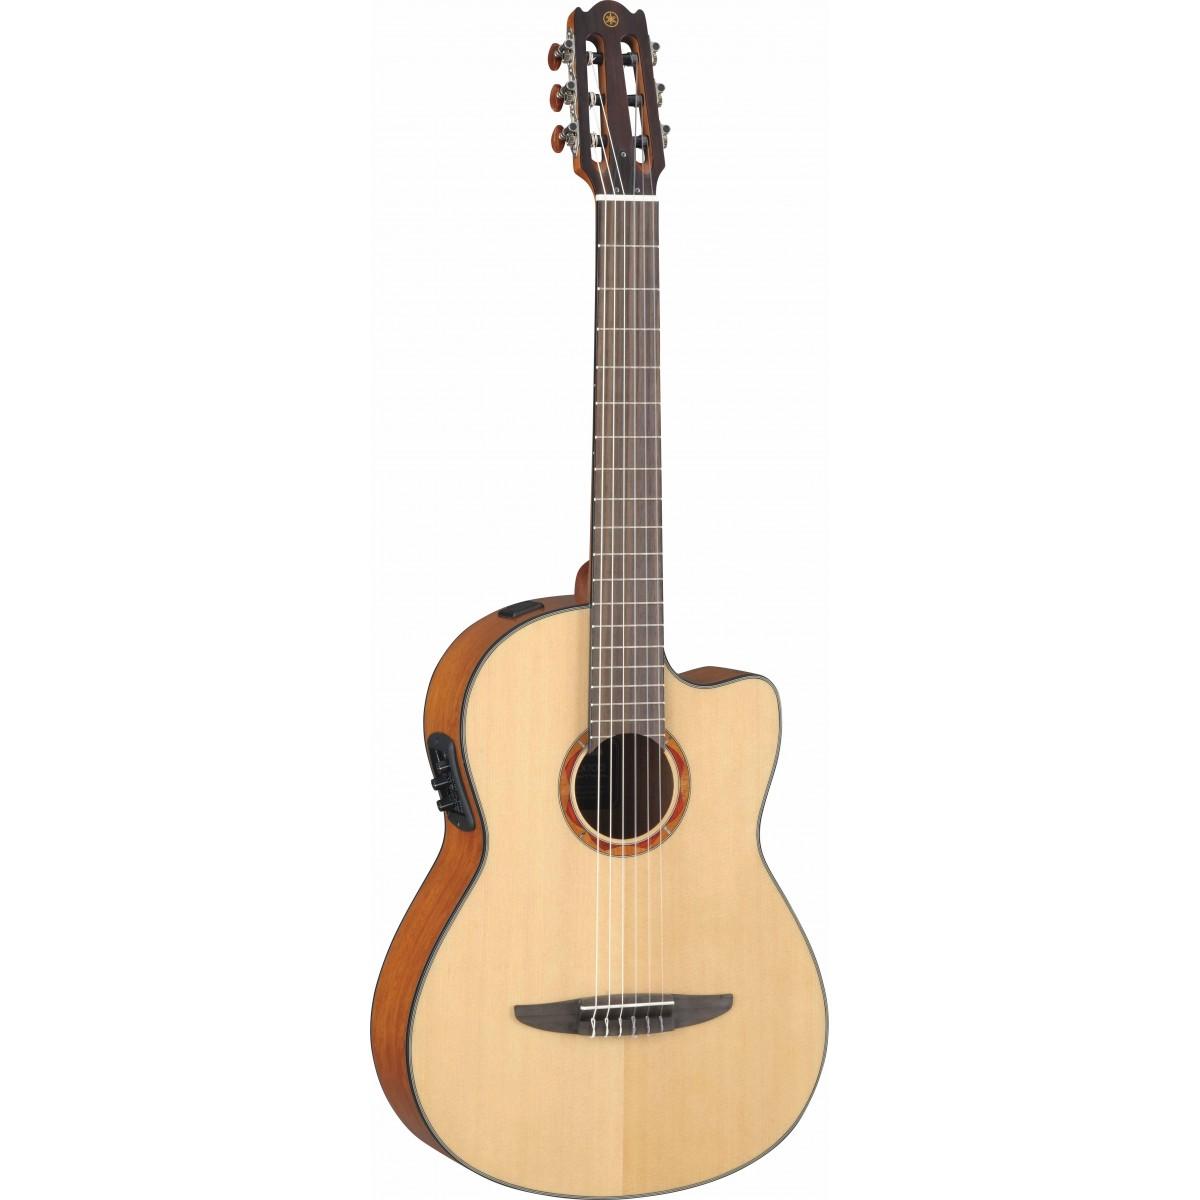 Violão Yamaha NCX 700 - Musical Perin